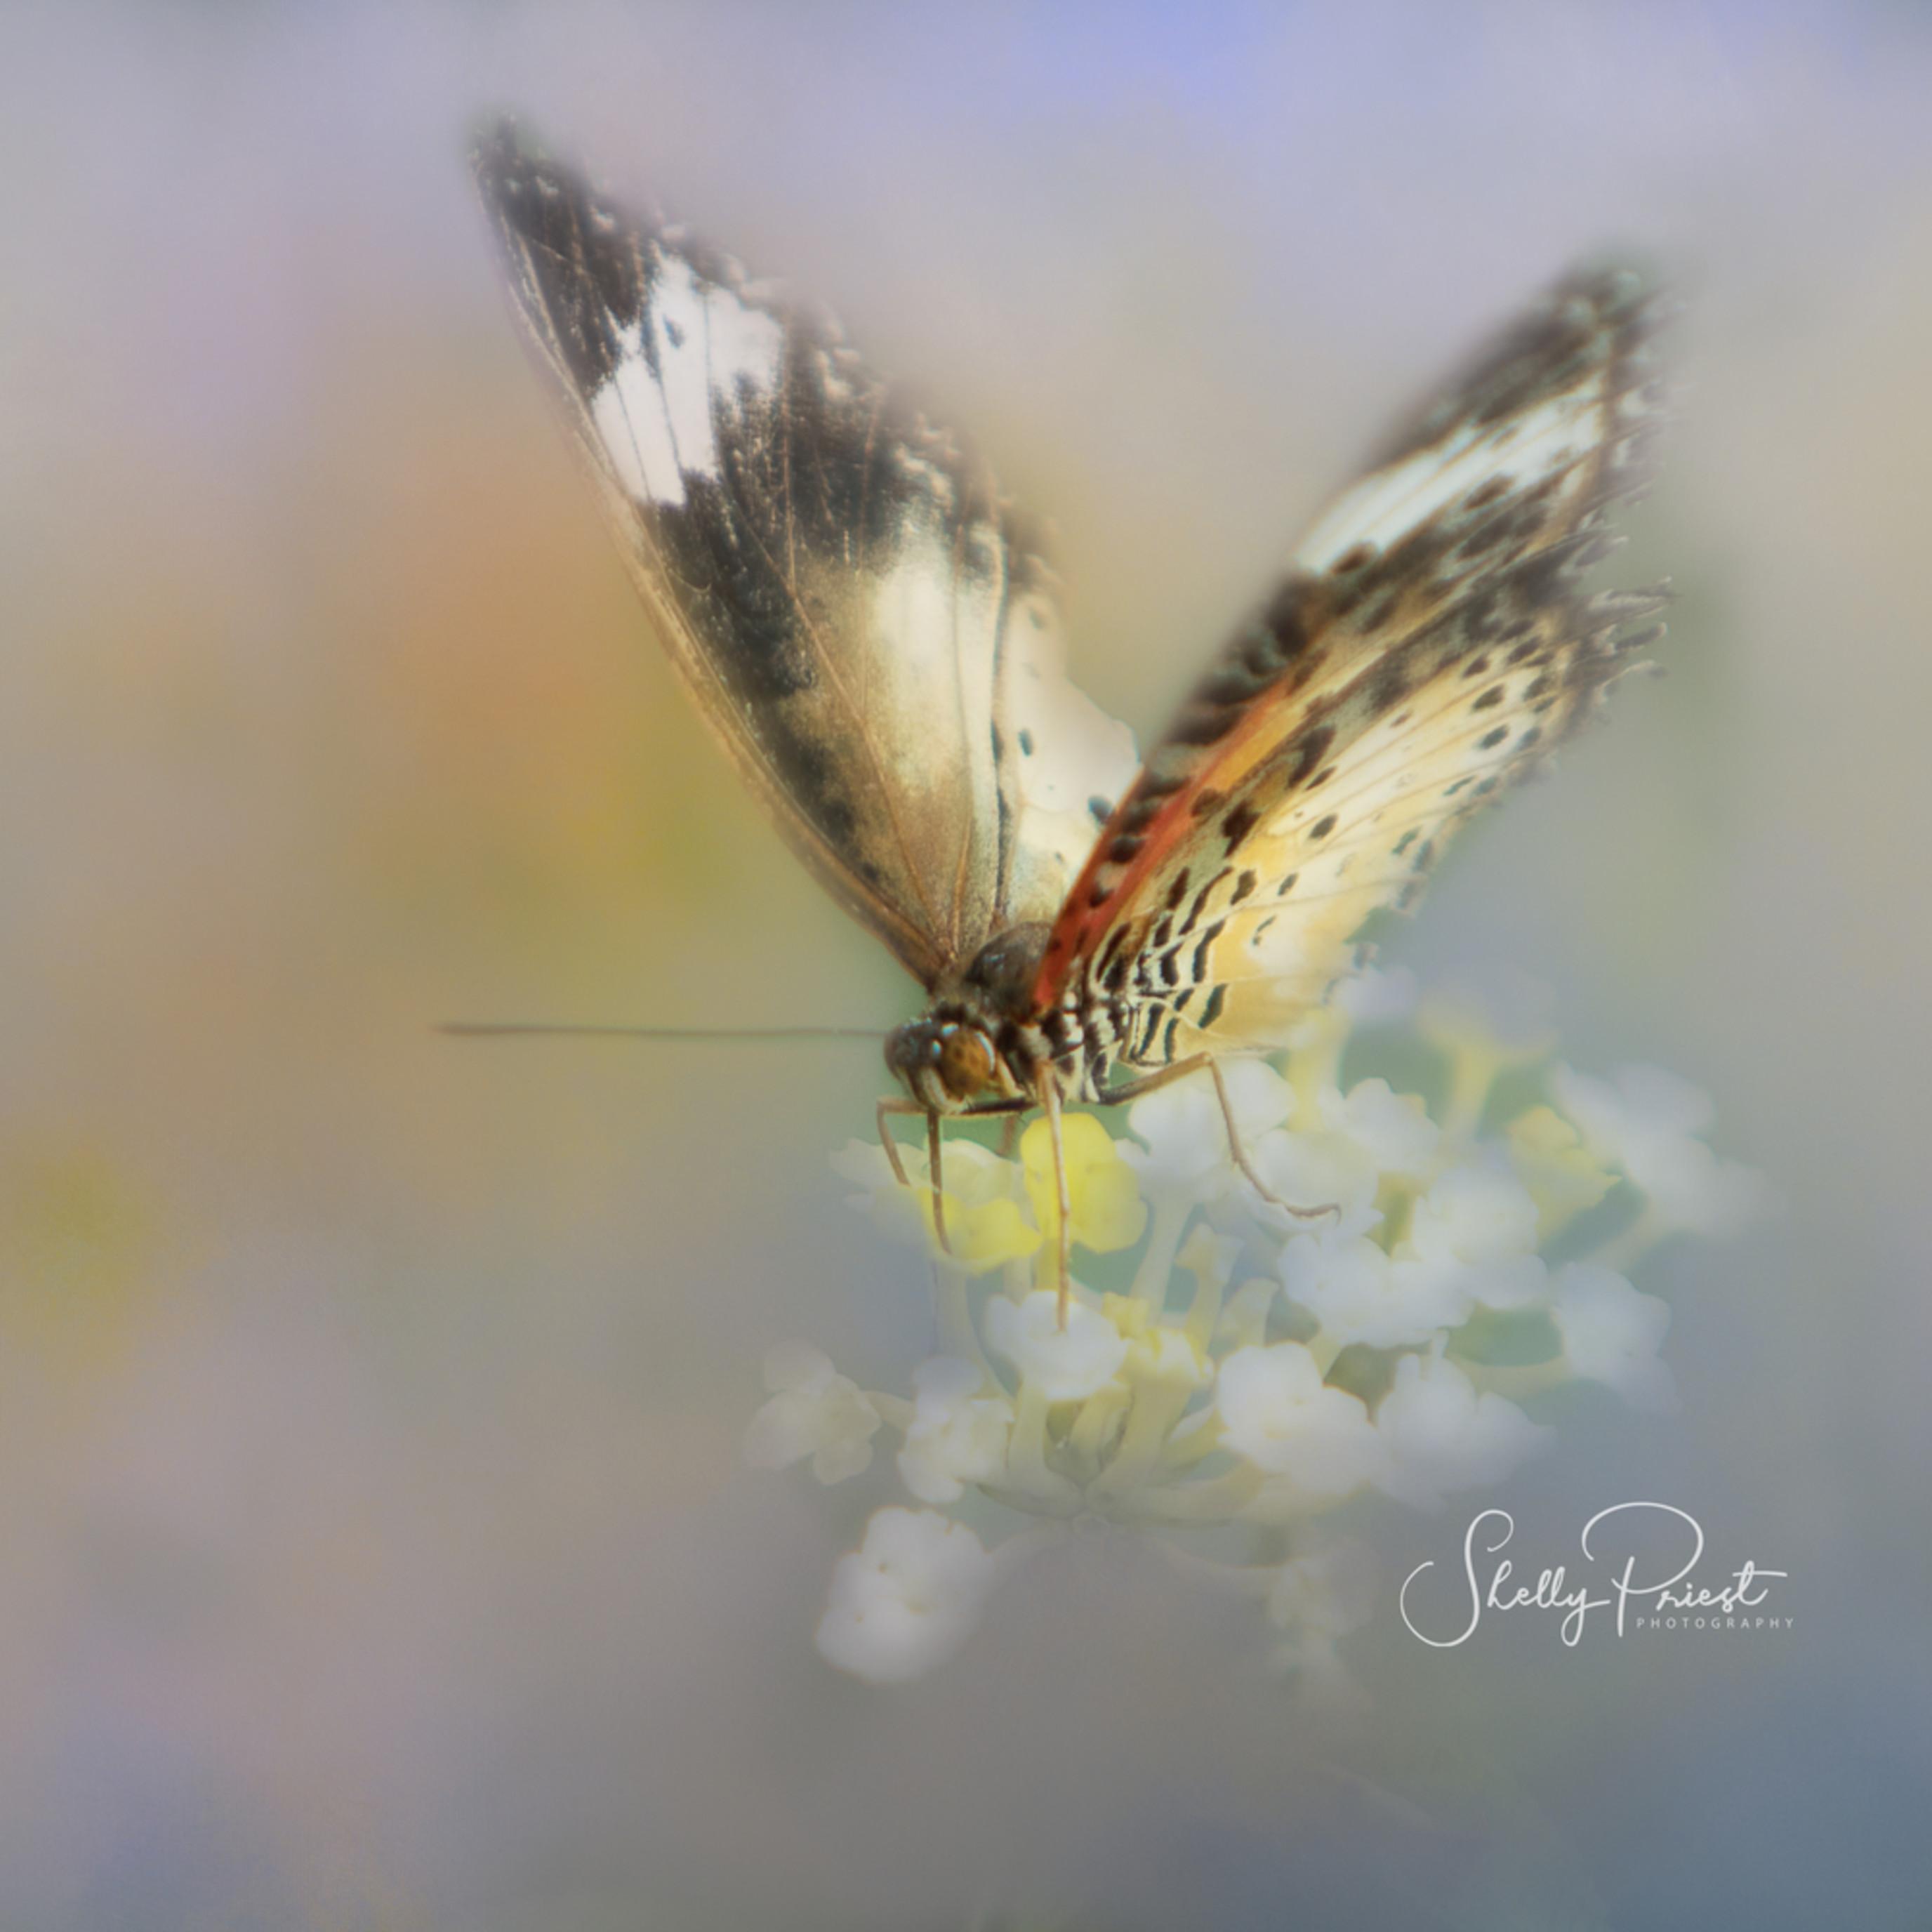 Butterfly 0811 j99qyk